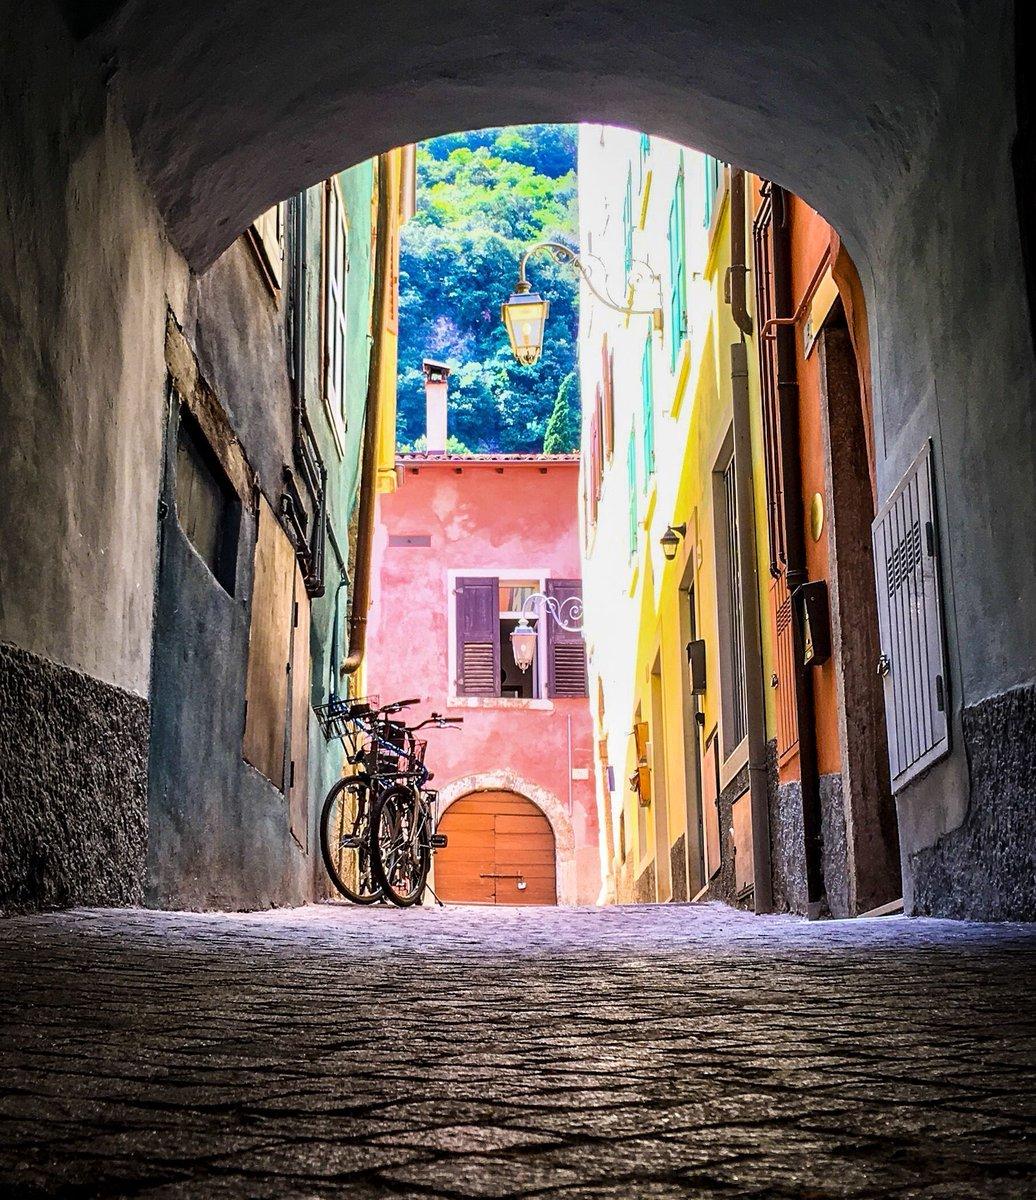 Sweet serene little alleyway in Italy :) https://t.co/EZ9Q436lQ5 https://t.co/cvUDxazIWr